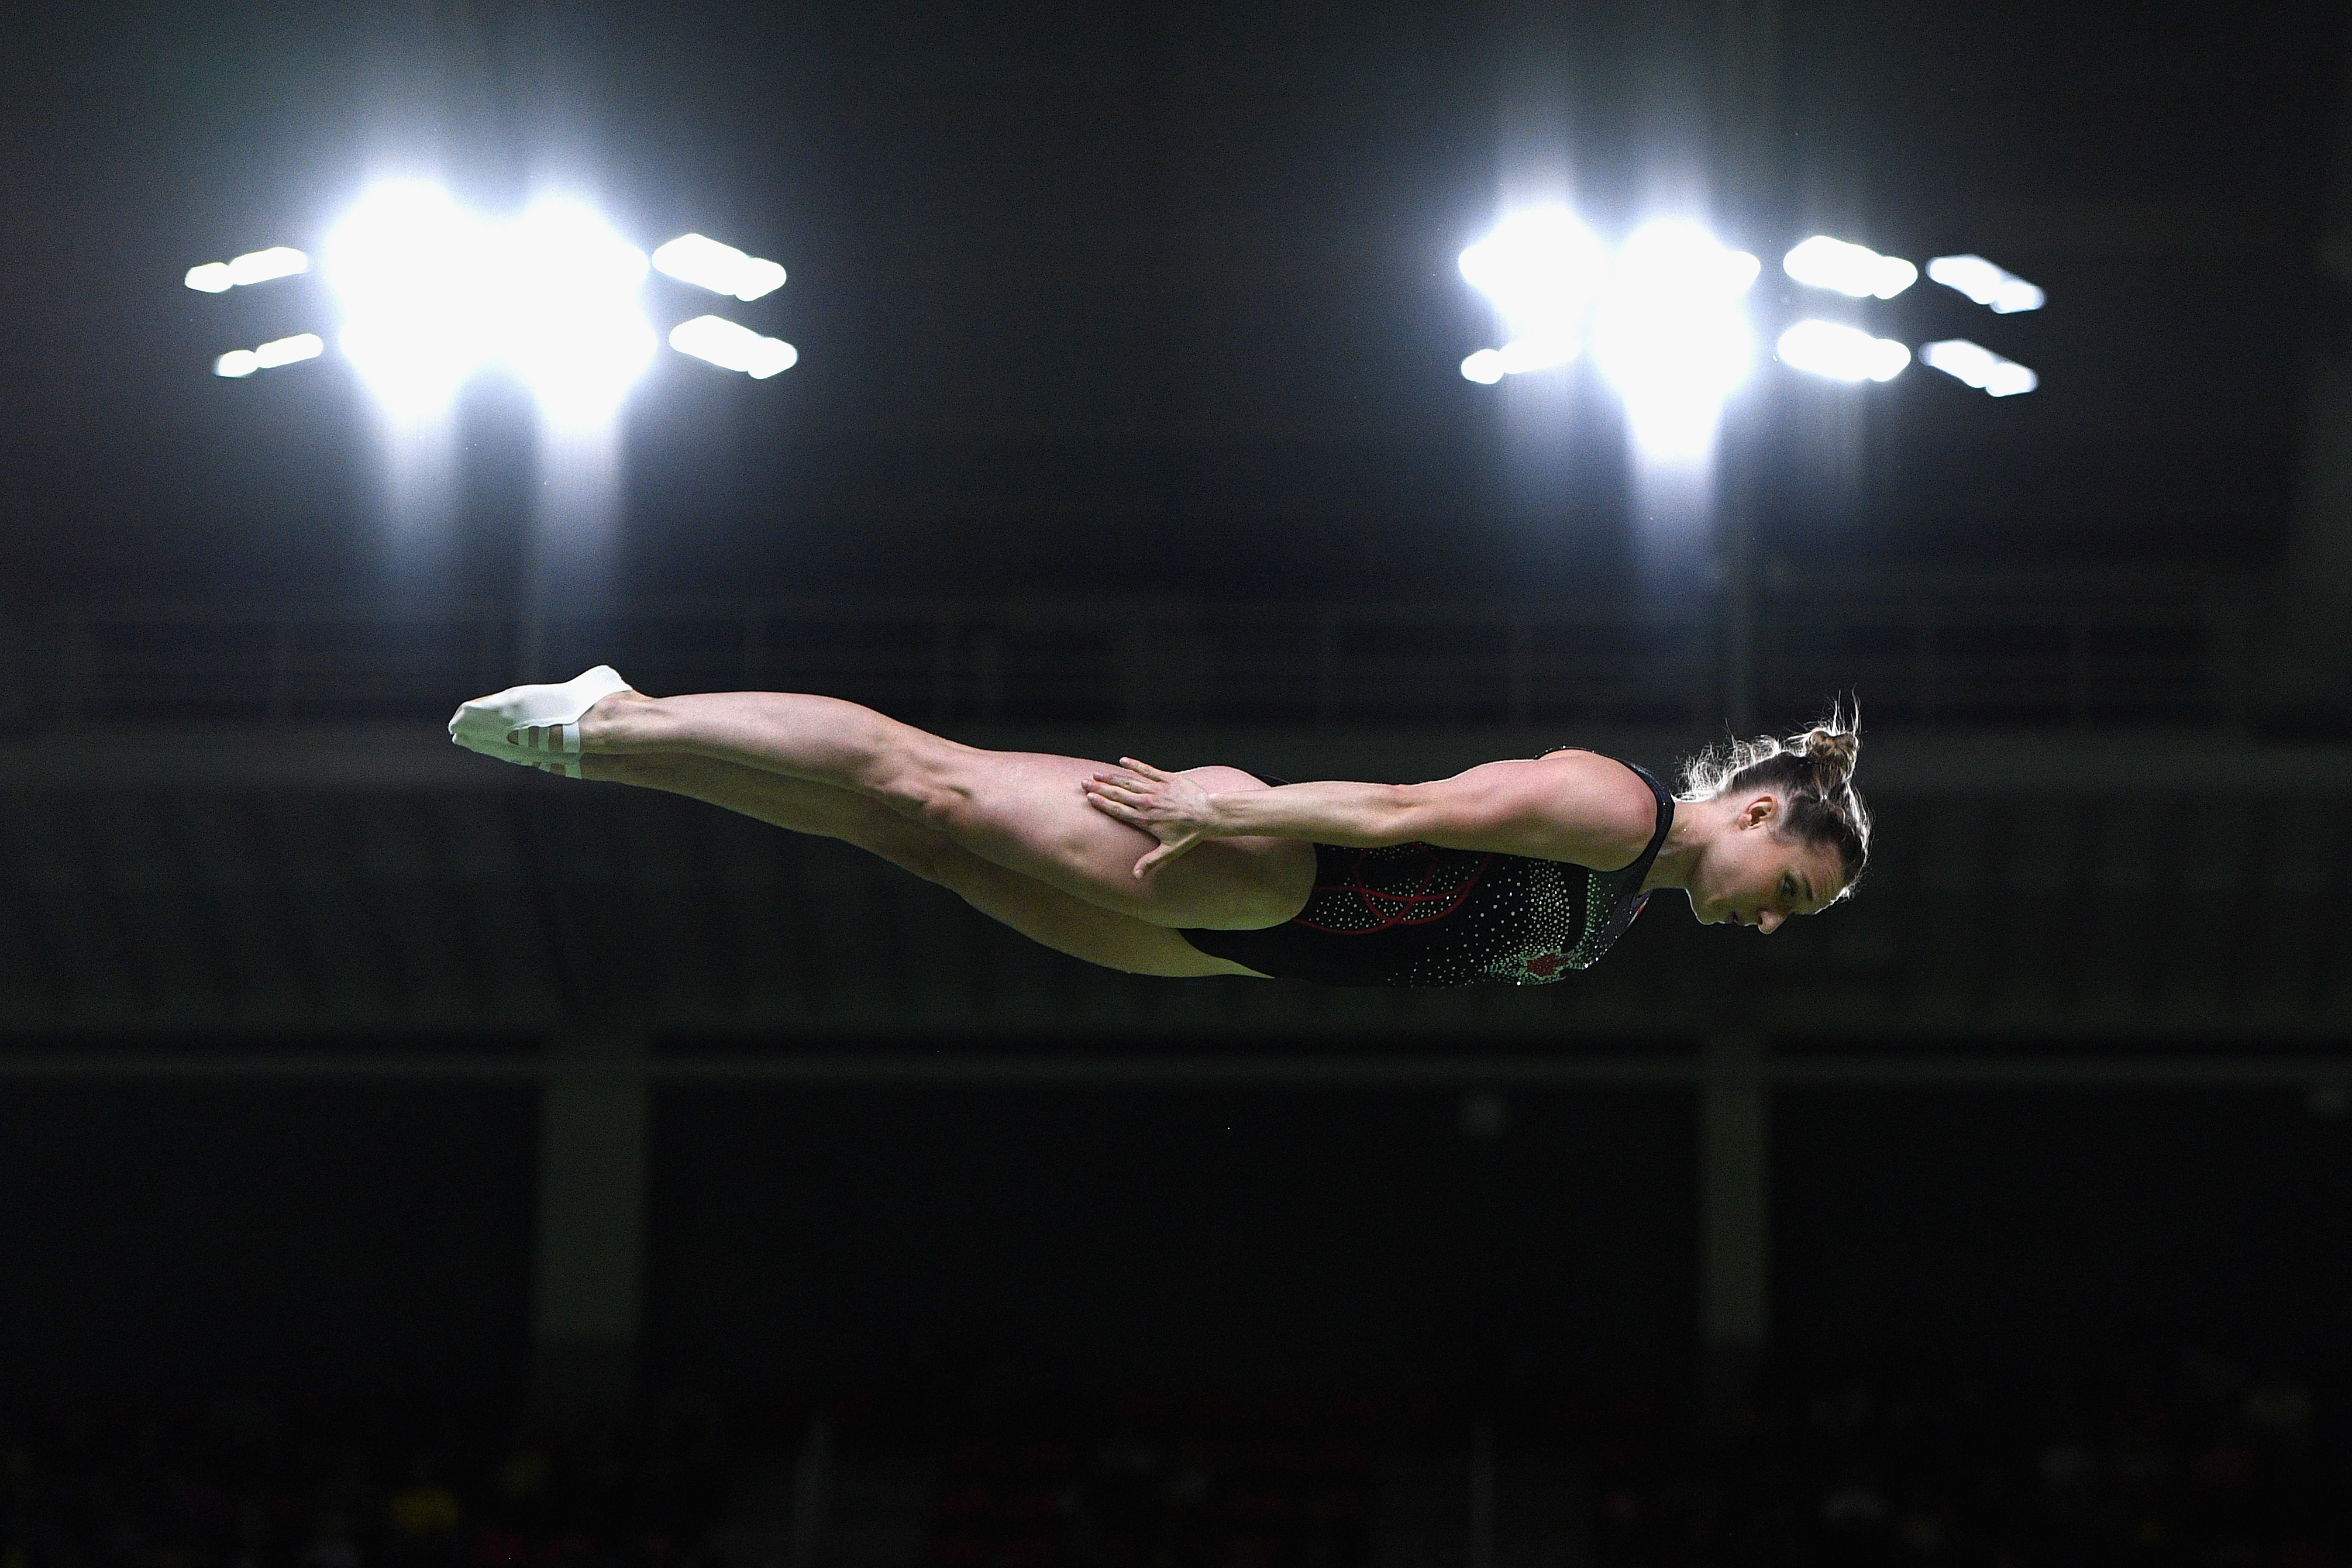 Une athlète en pleine figure de trampoline.